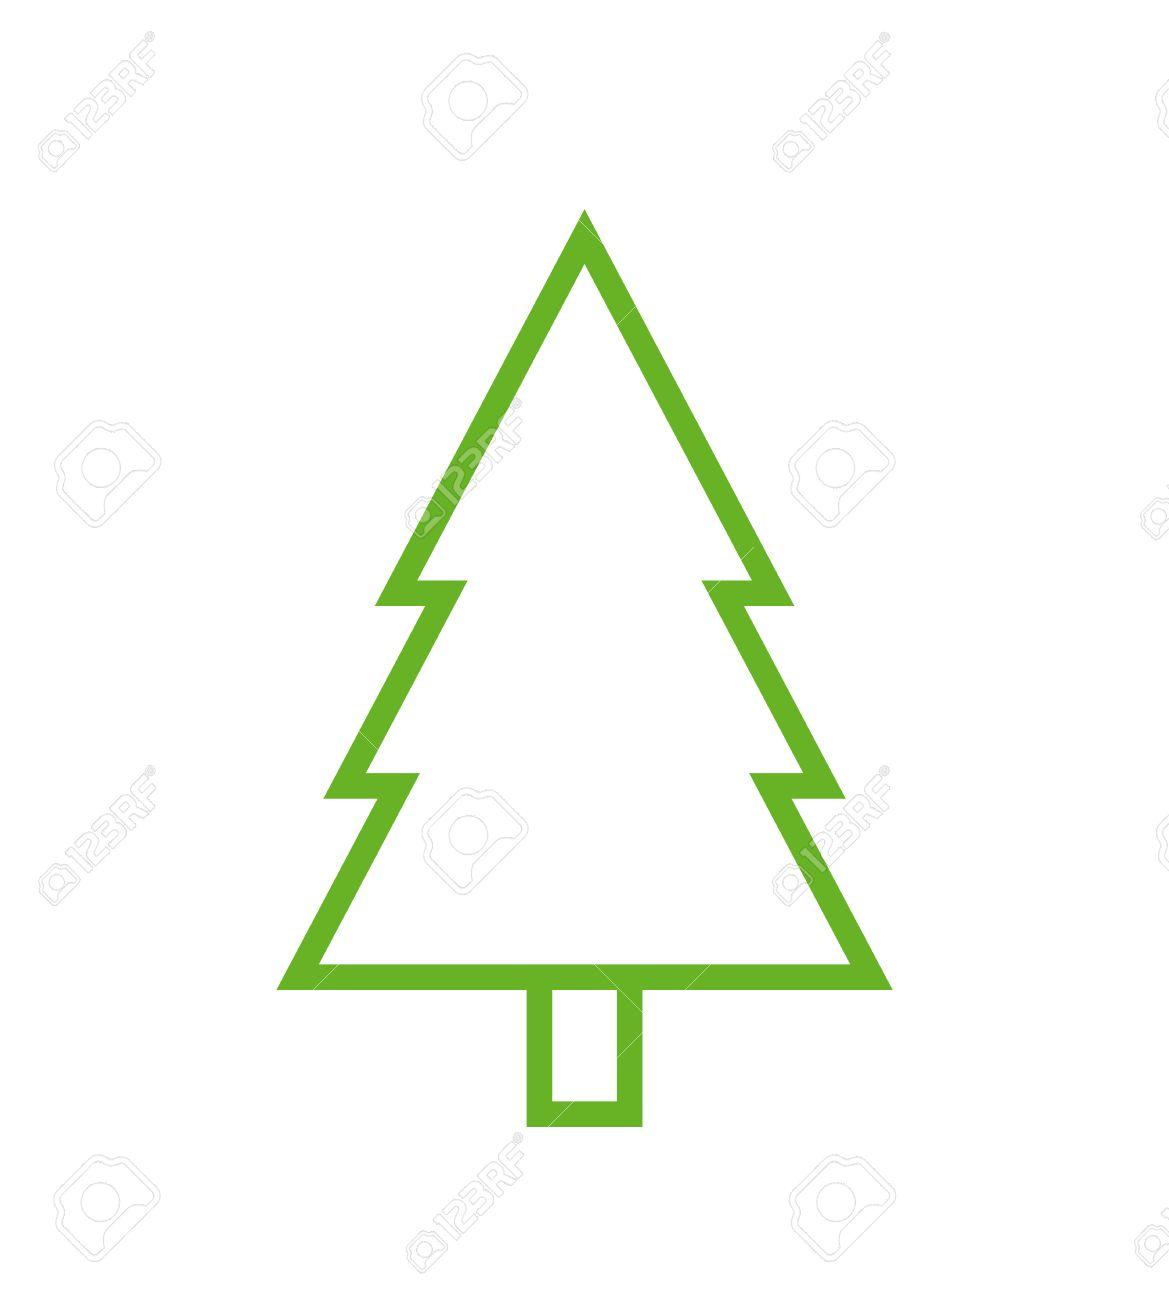 fir tree outline icon modern minimal flat design style spruce